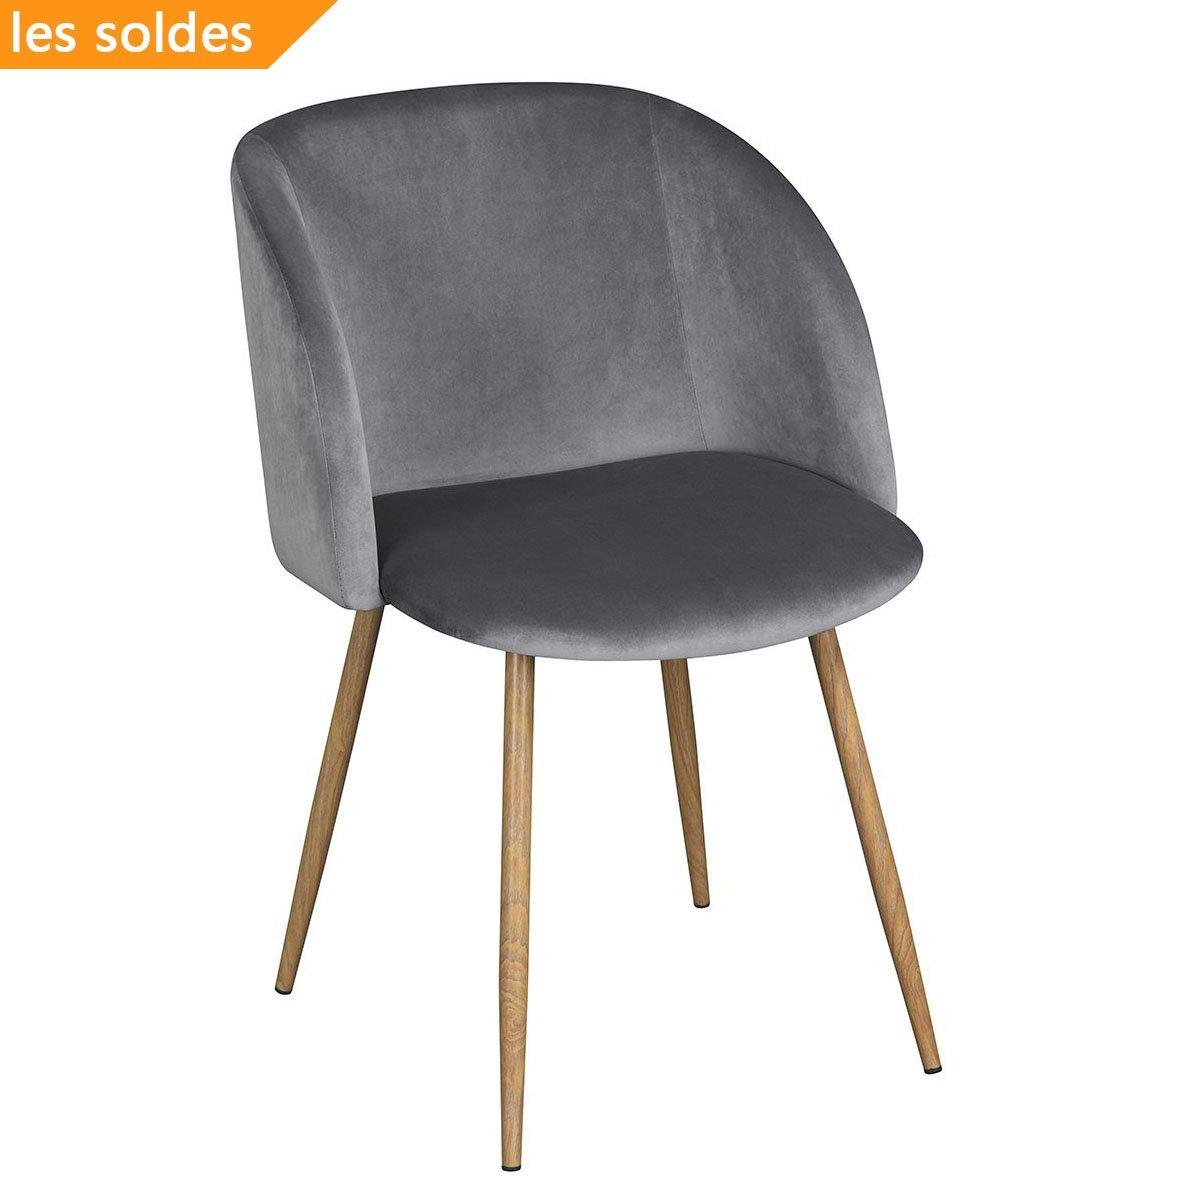 Clubsessel weiß grau  1er Set Vintager Retro Stuhl Polstersessel Samt Lounge sessel ...